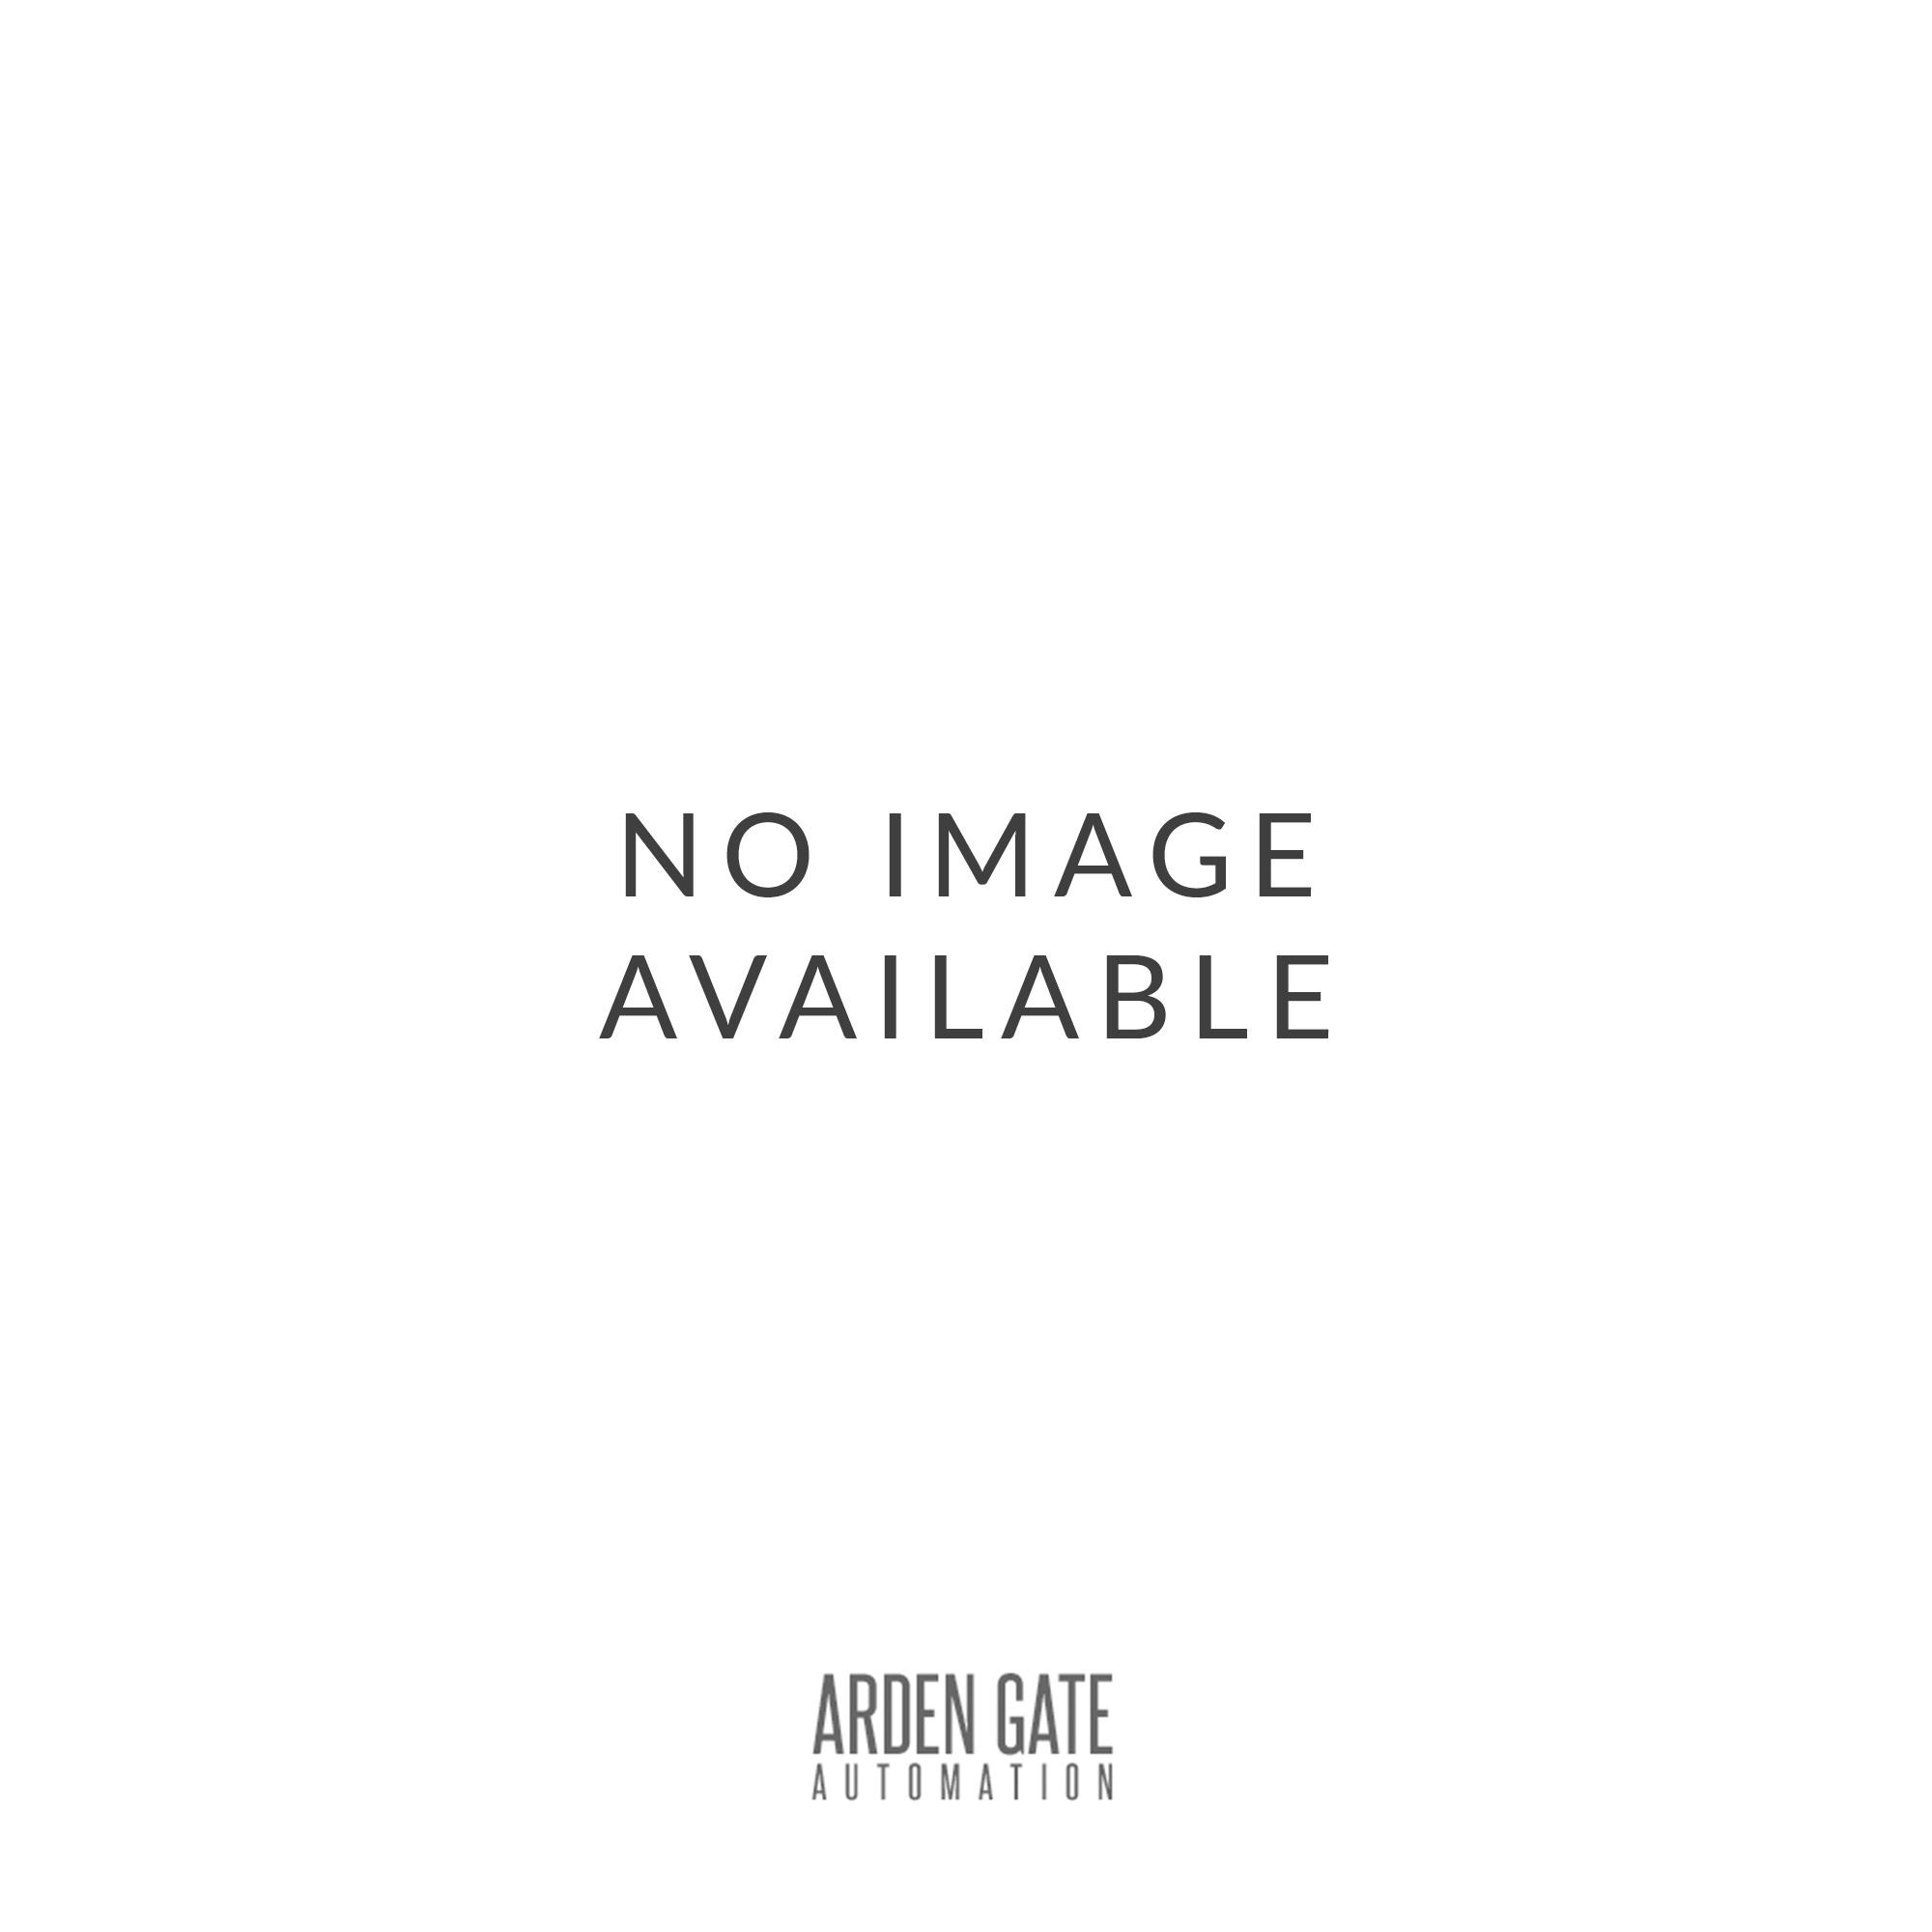 CDVI DGPROX Compact Proximity Reader - 500 Users